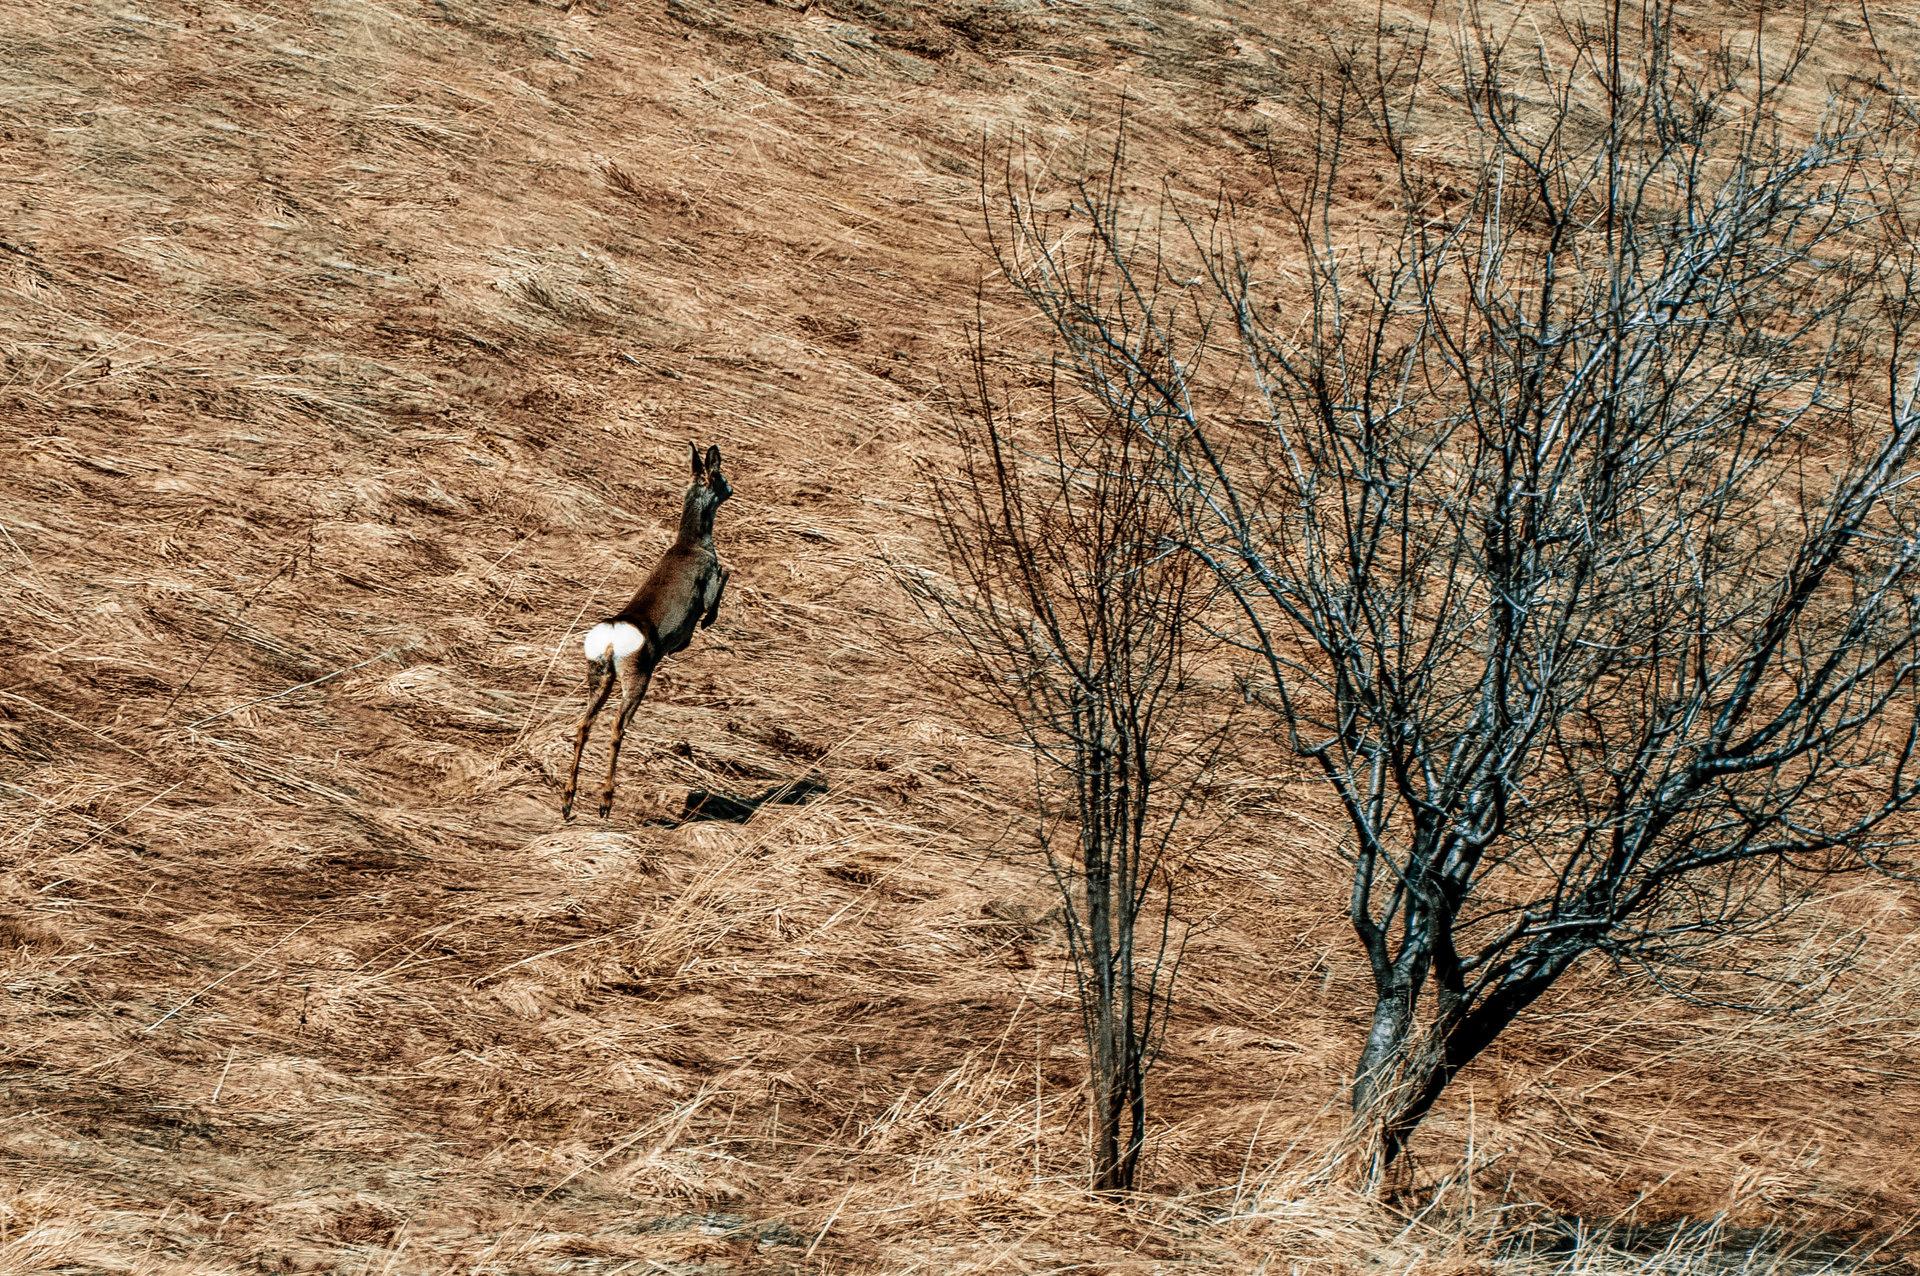 Bambi in flight | Author Dimitar Bakalov - GetBG | PHOTO FORUM